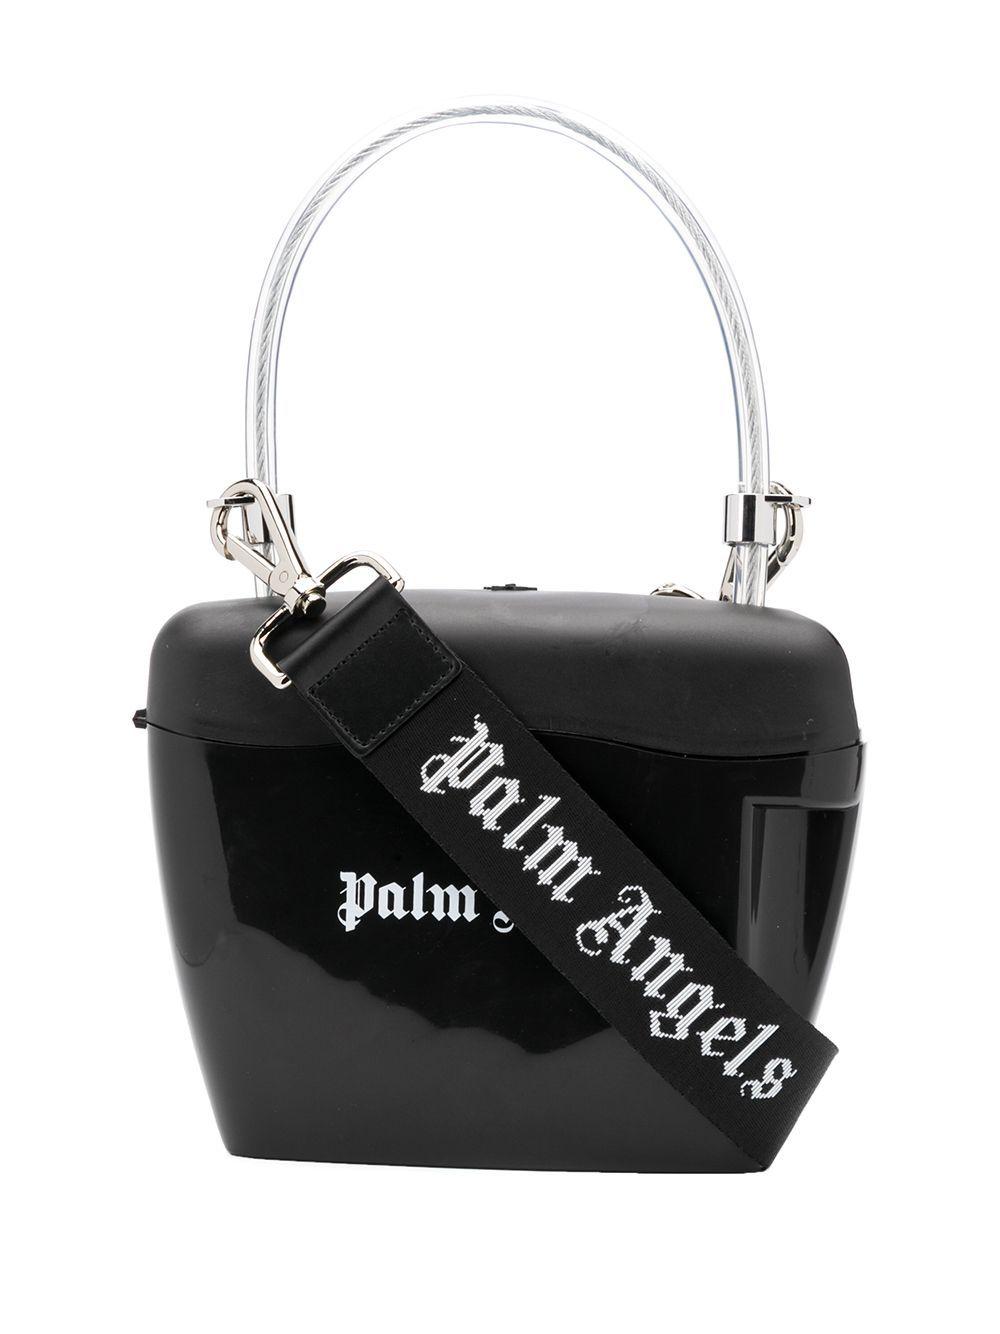 Palm Angels Women's Black Pvc Handbag